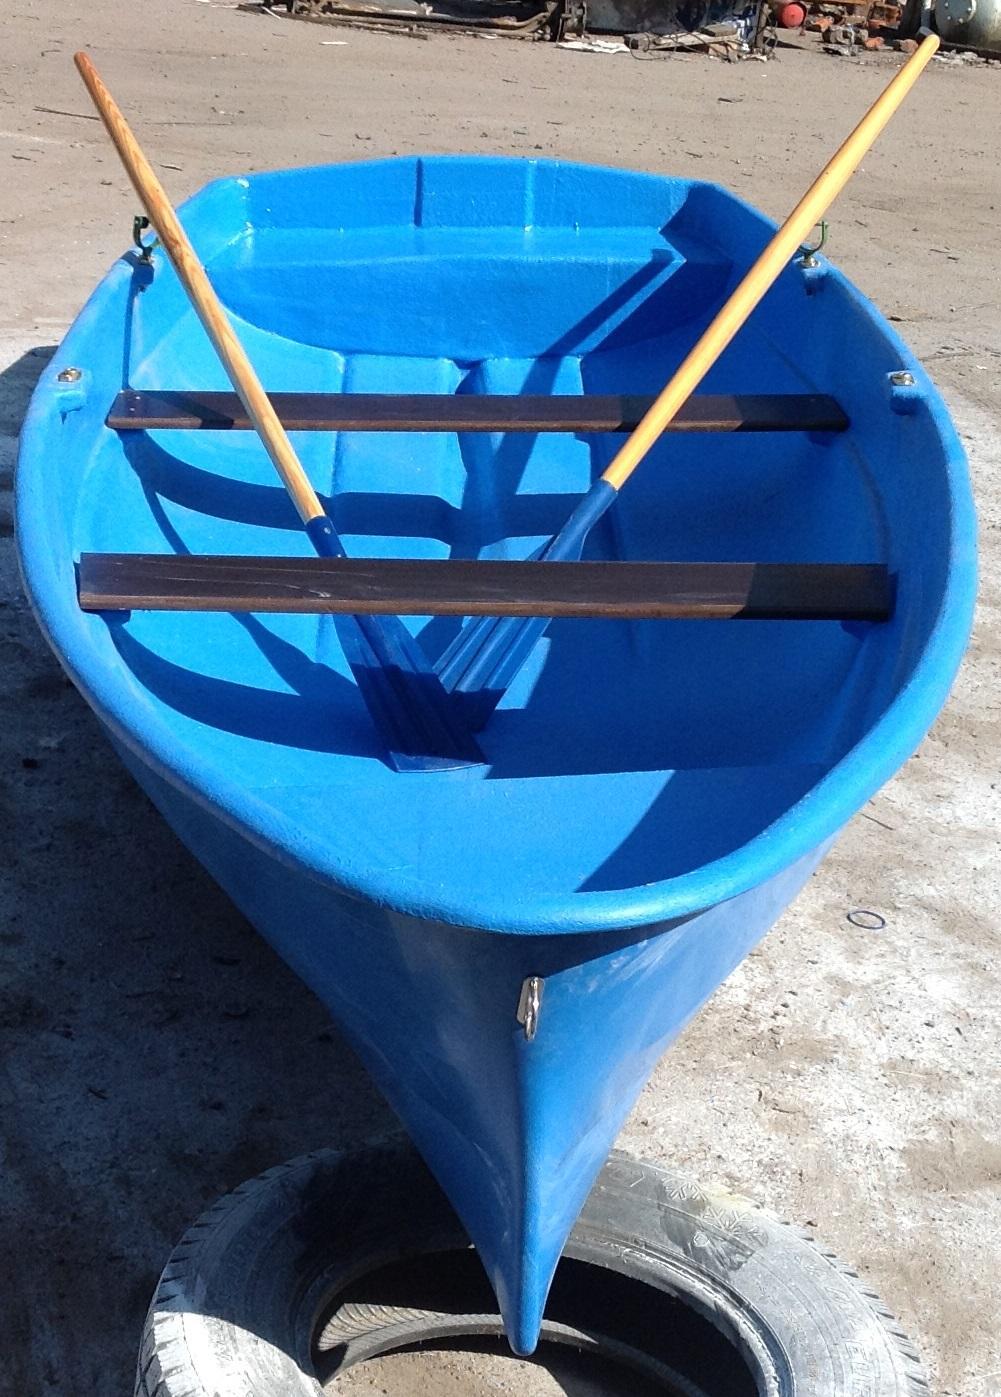 лодки получи и распишись основе стеклопластика